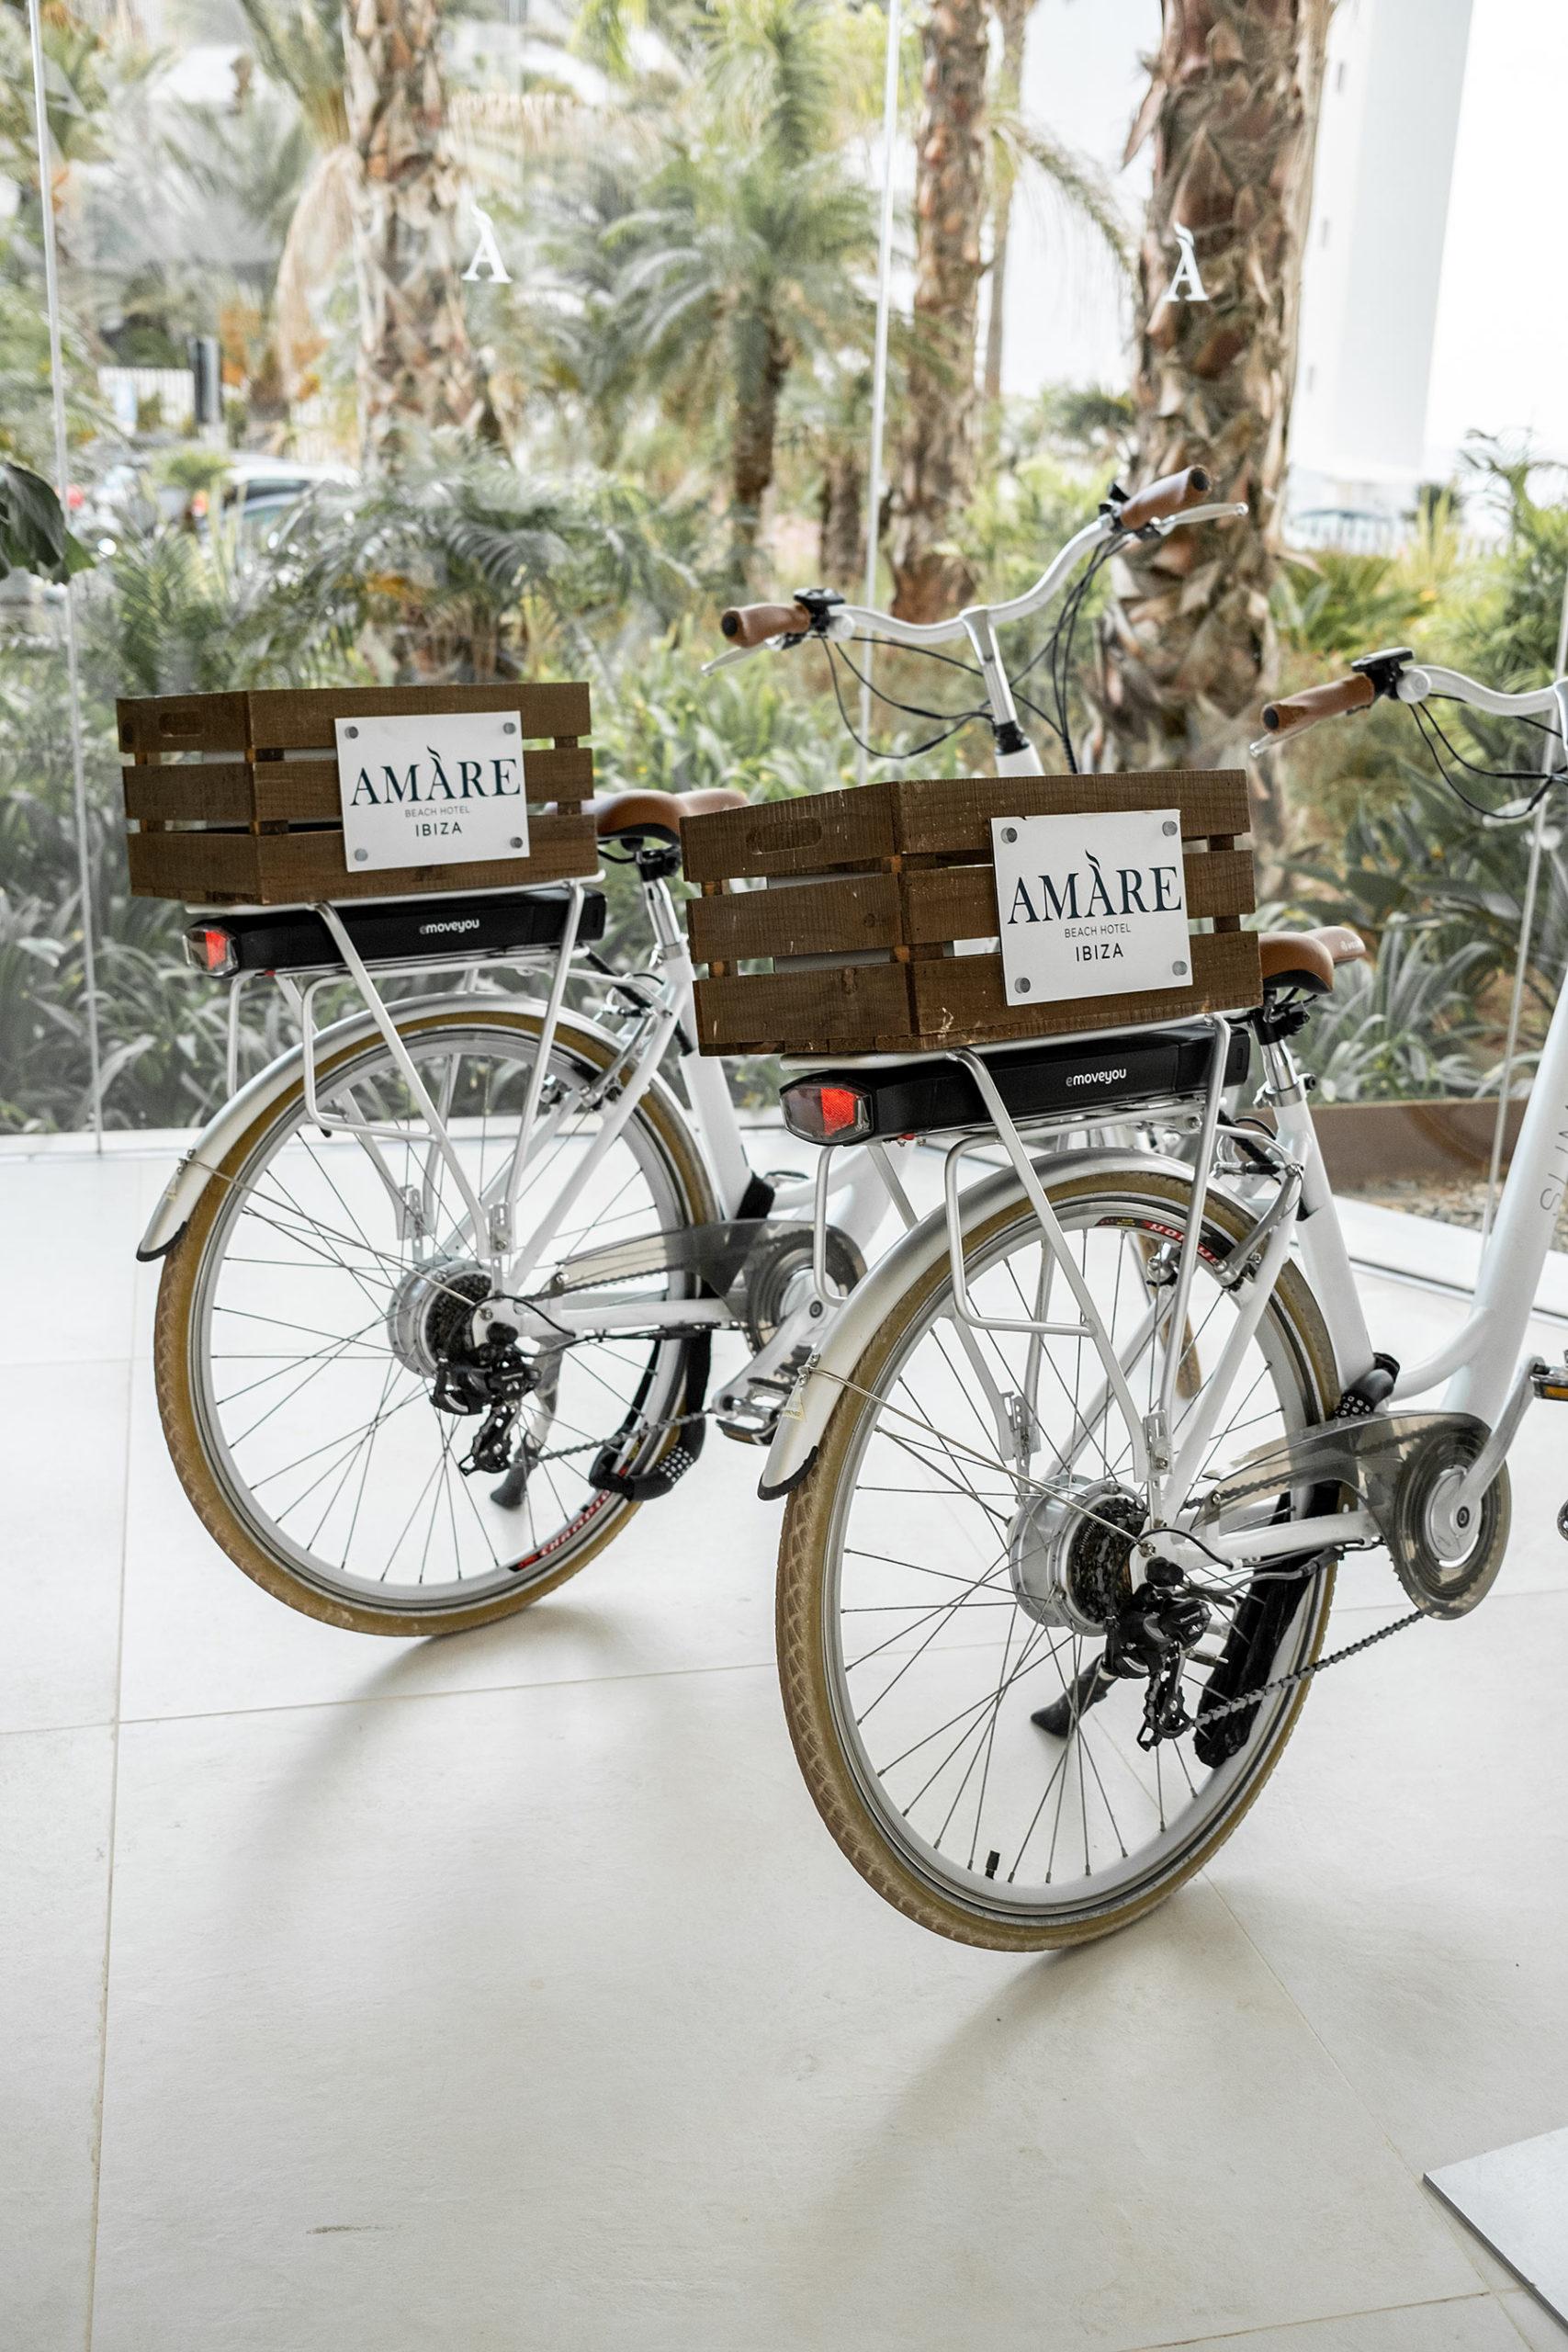 amare beach ibiza fahrrad verleih travel blog sunnyinga